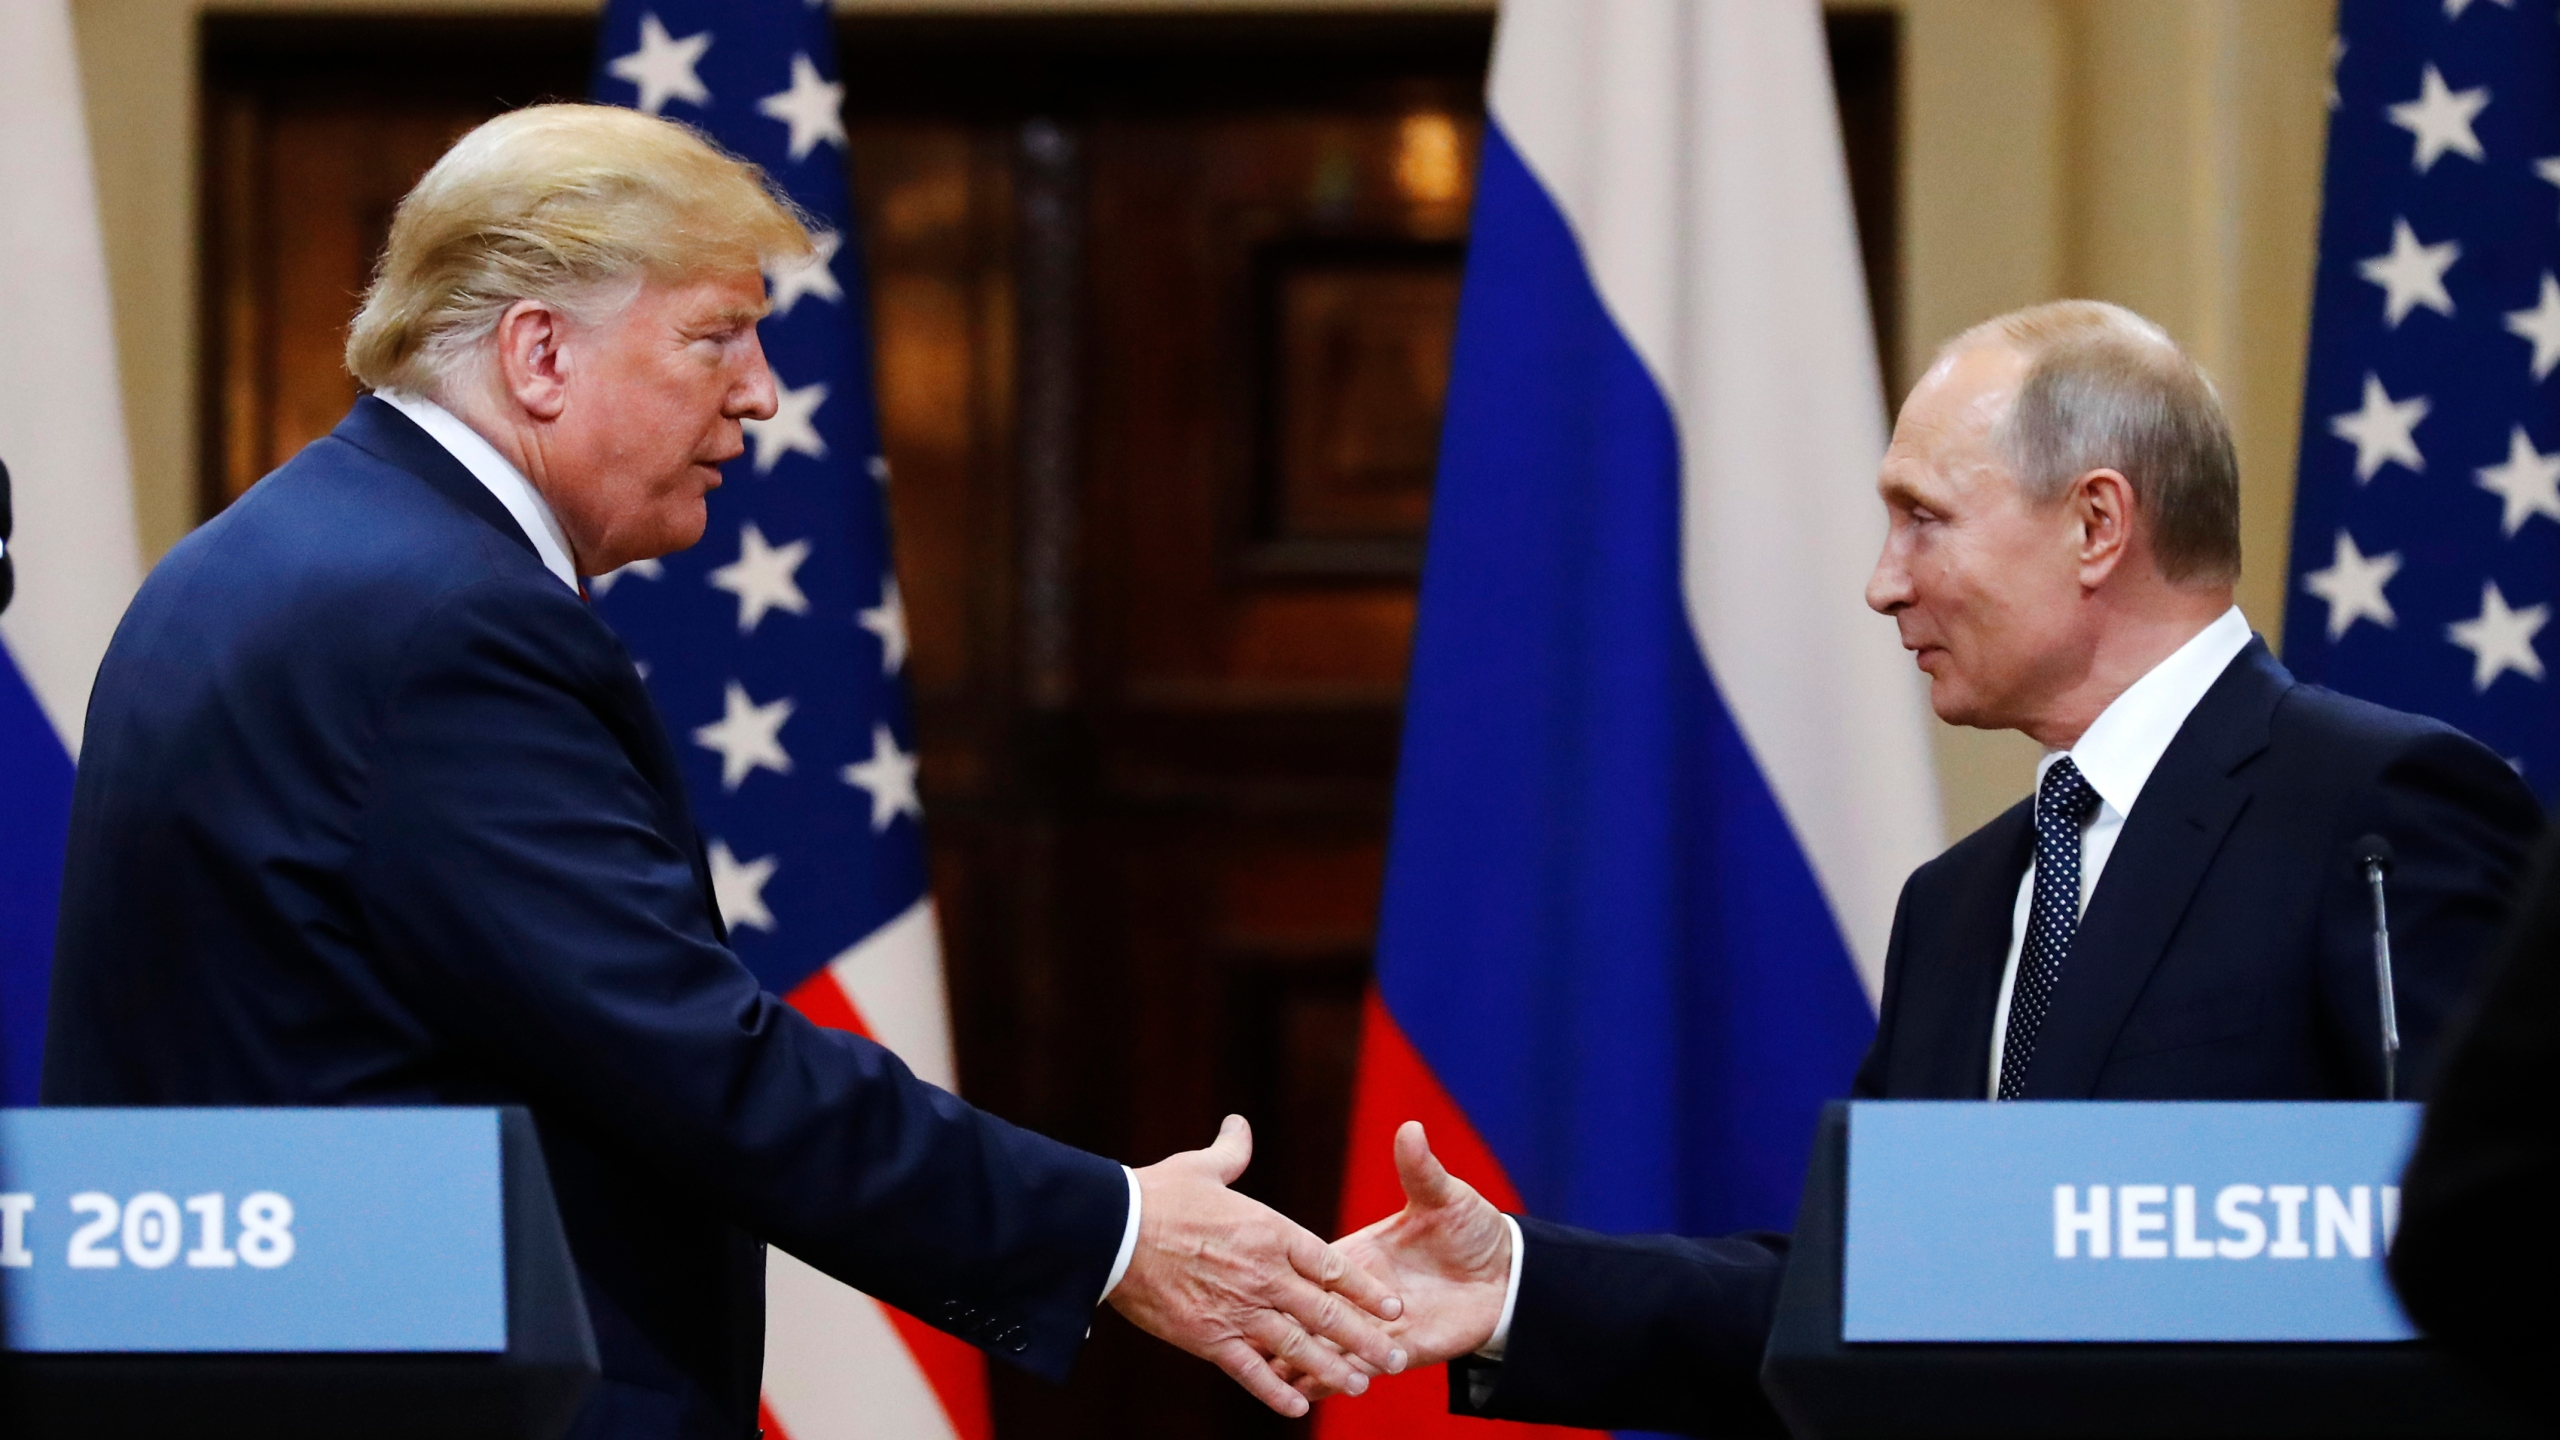 APTOPIX_Finland_Trump_Putin_Summit_66350-159532.jpg15749154